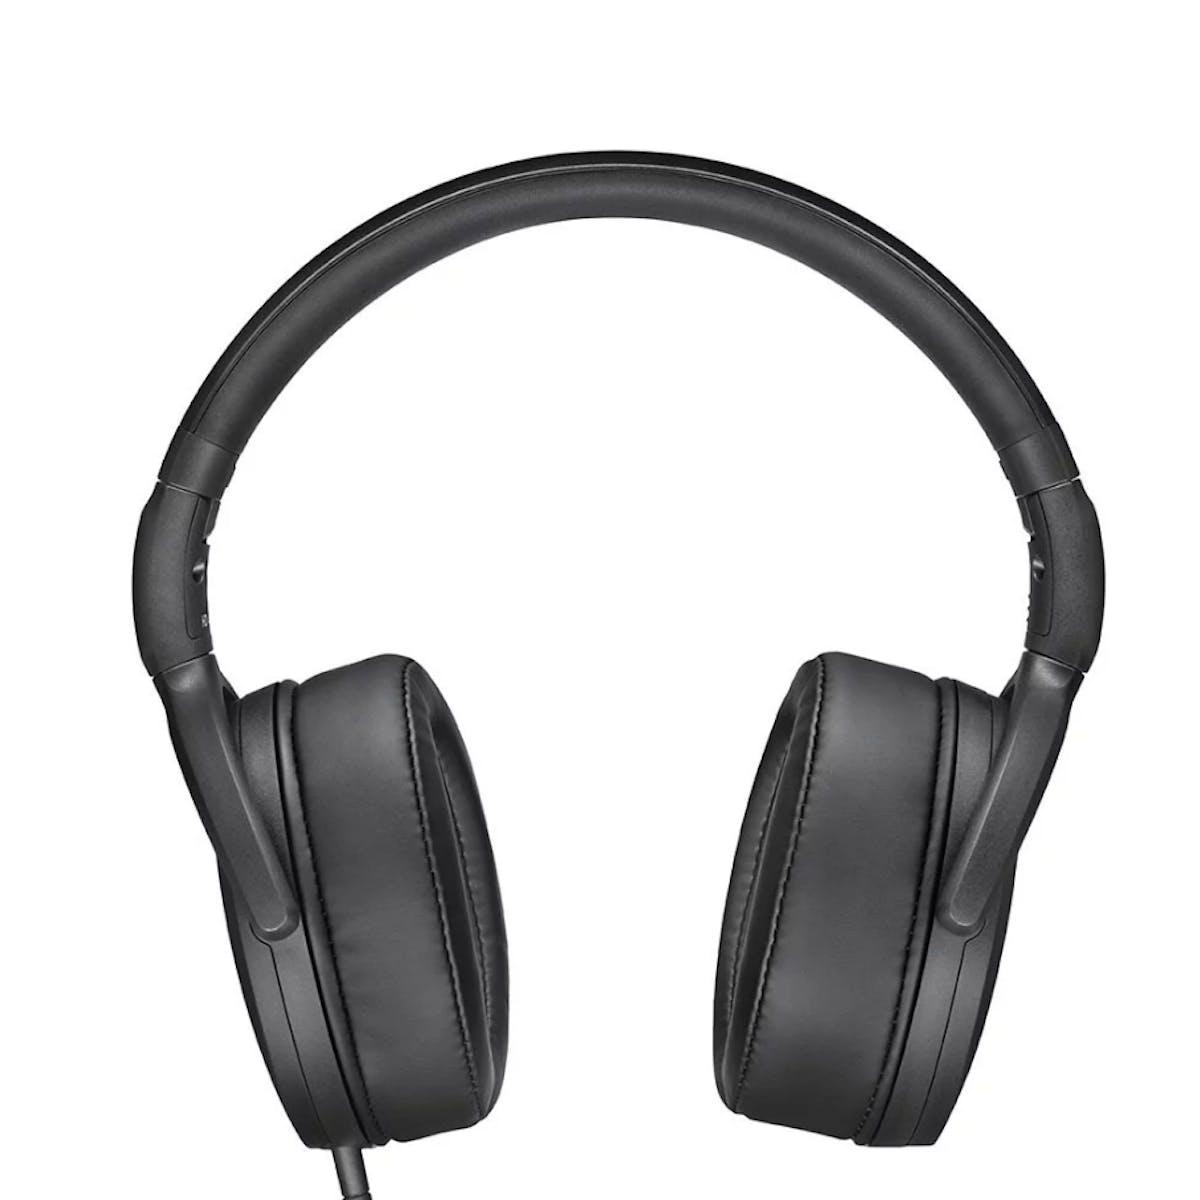 Sennheiser Headphones Are Better Than Your Headphones and You Deserve Them